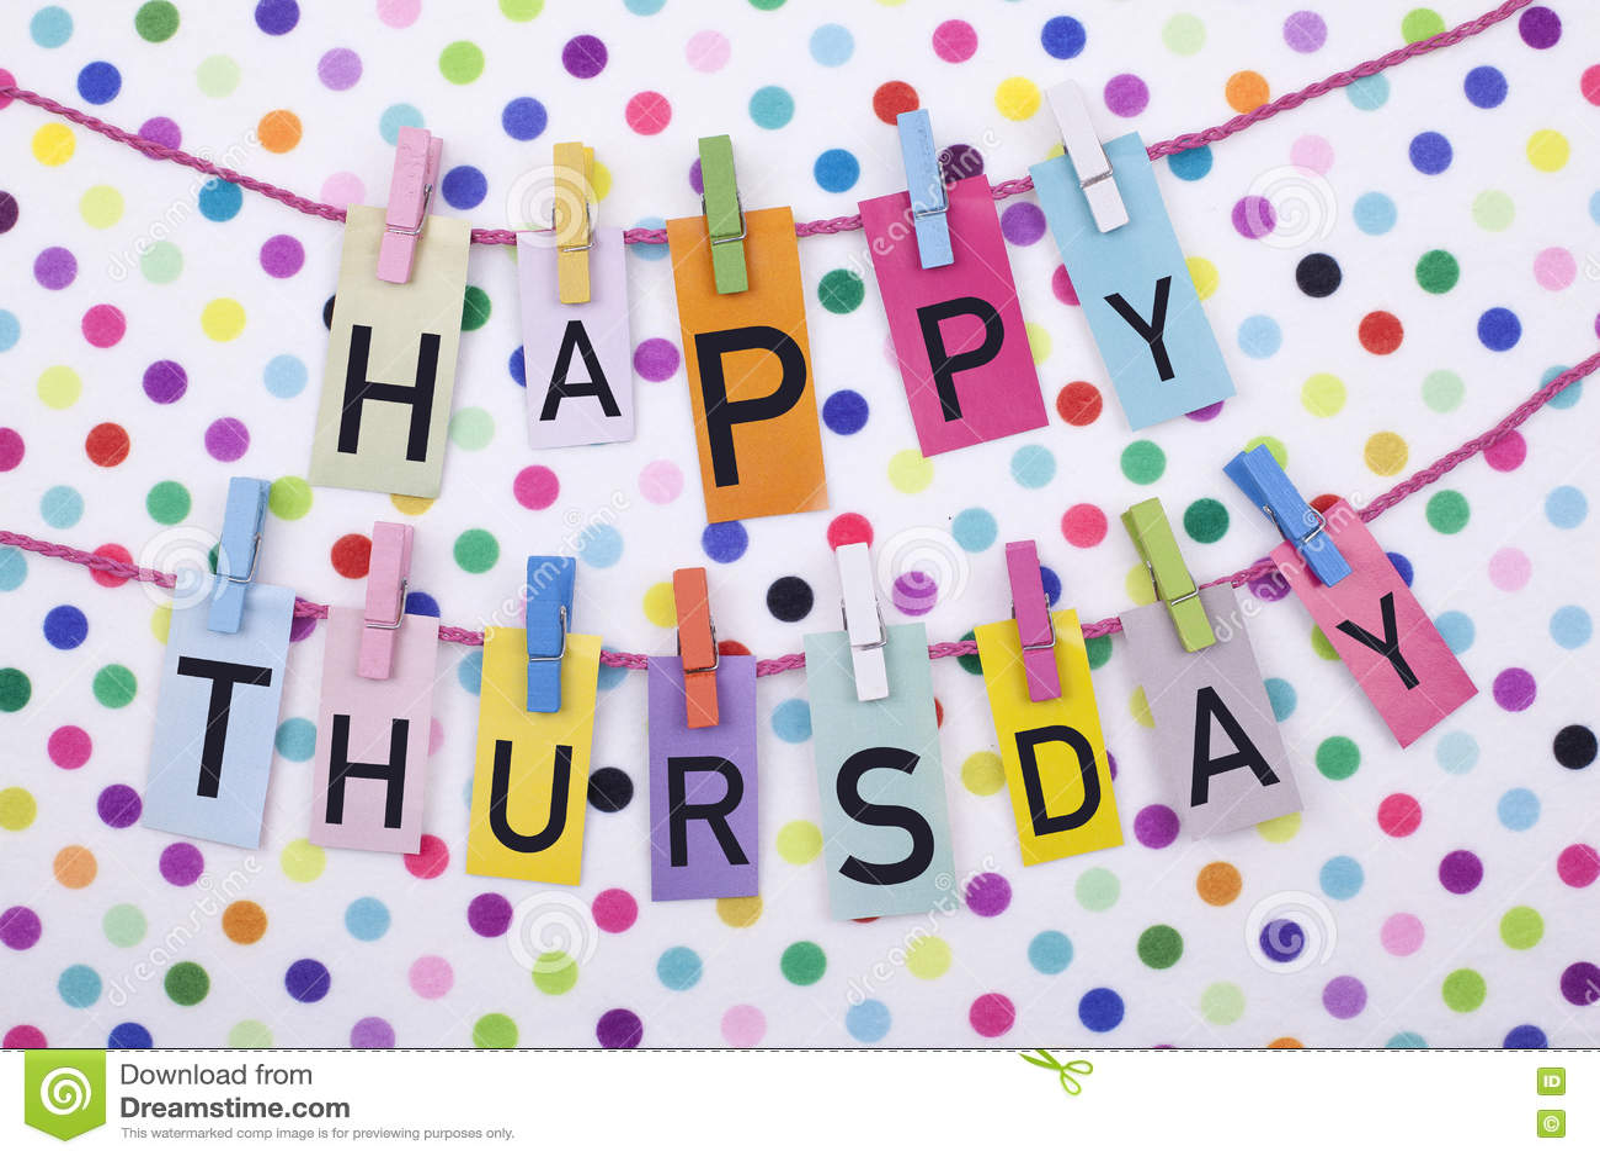 Happy thursday stock image image of text hello cheerful 54757641 happy thursday m4hsunfo